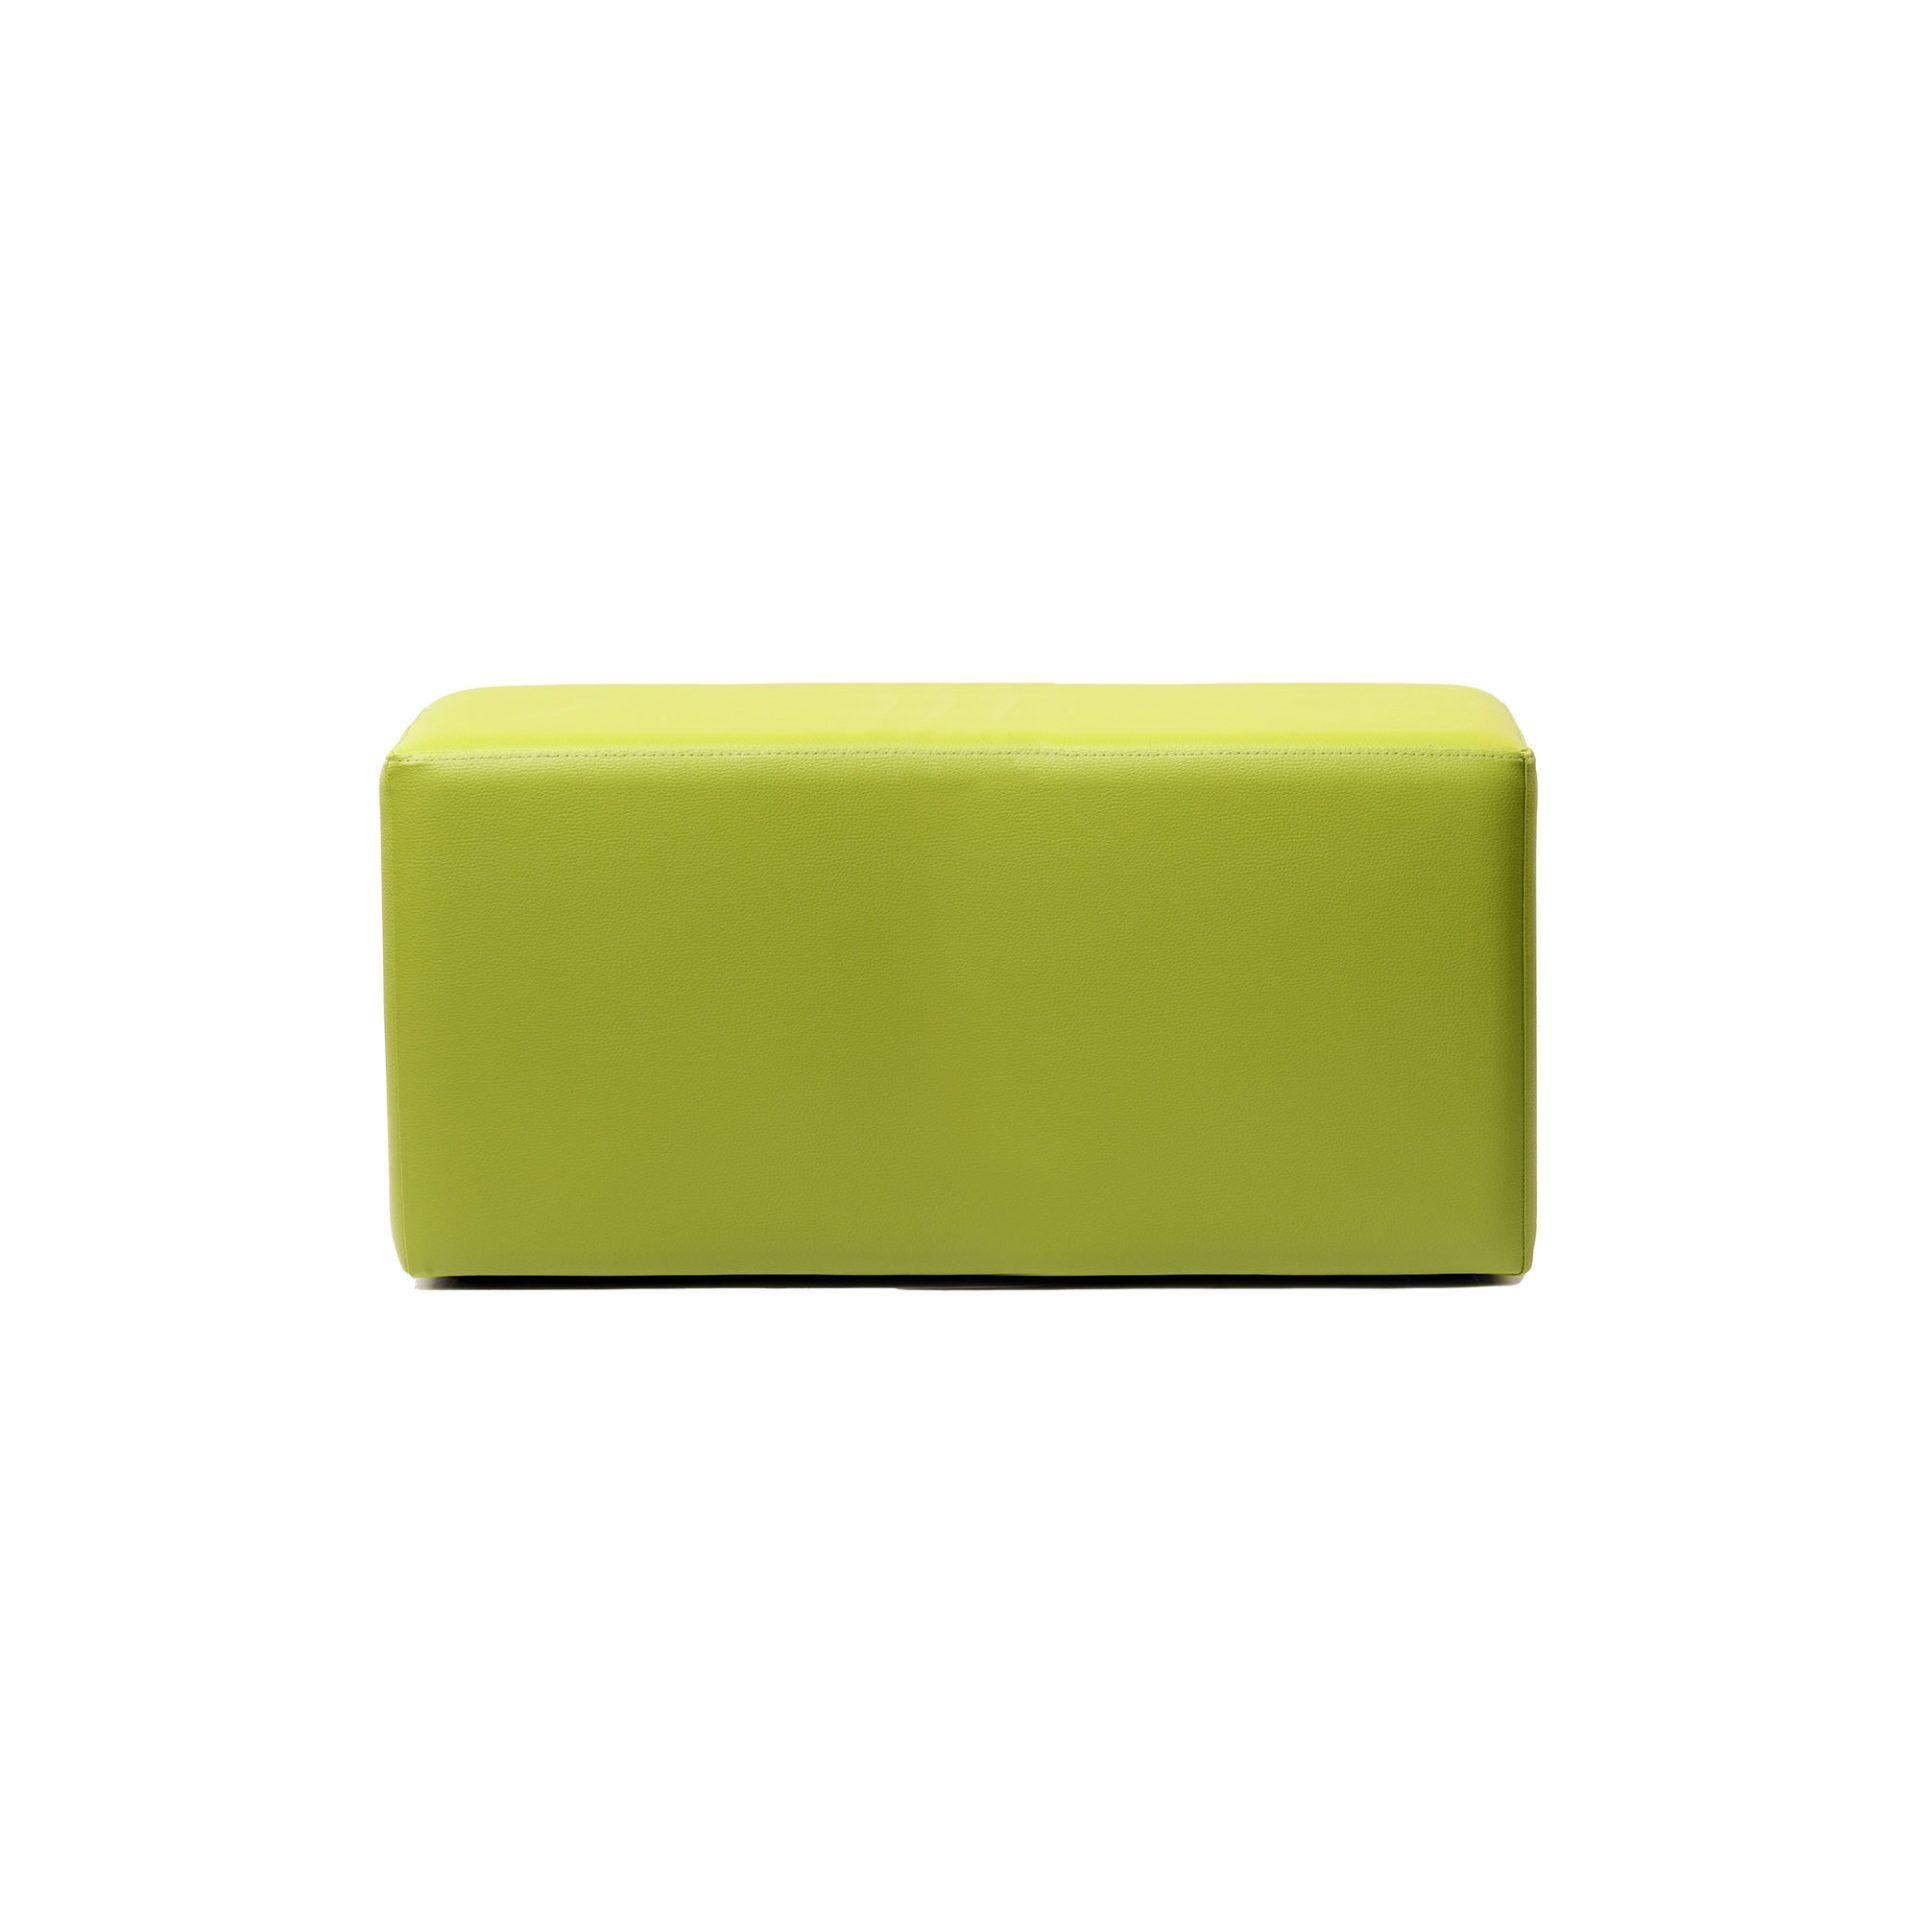 ottoman rectangle green01